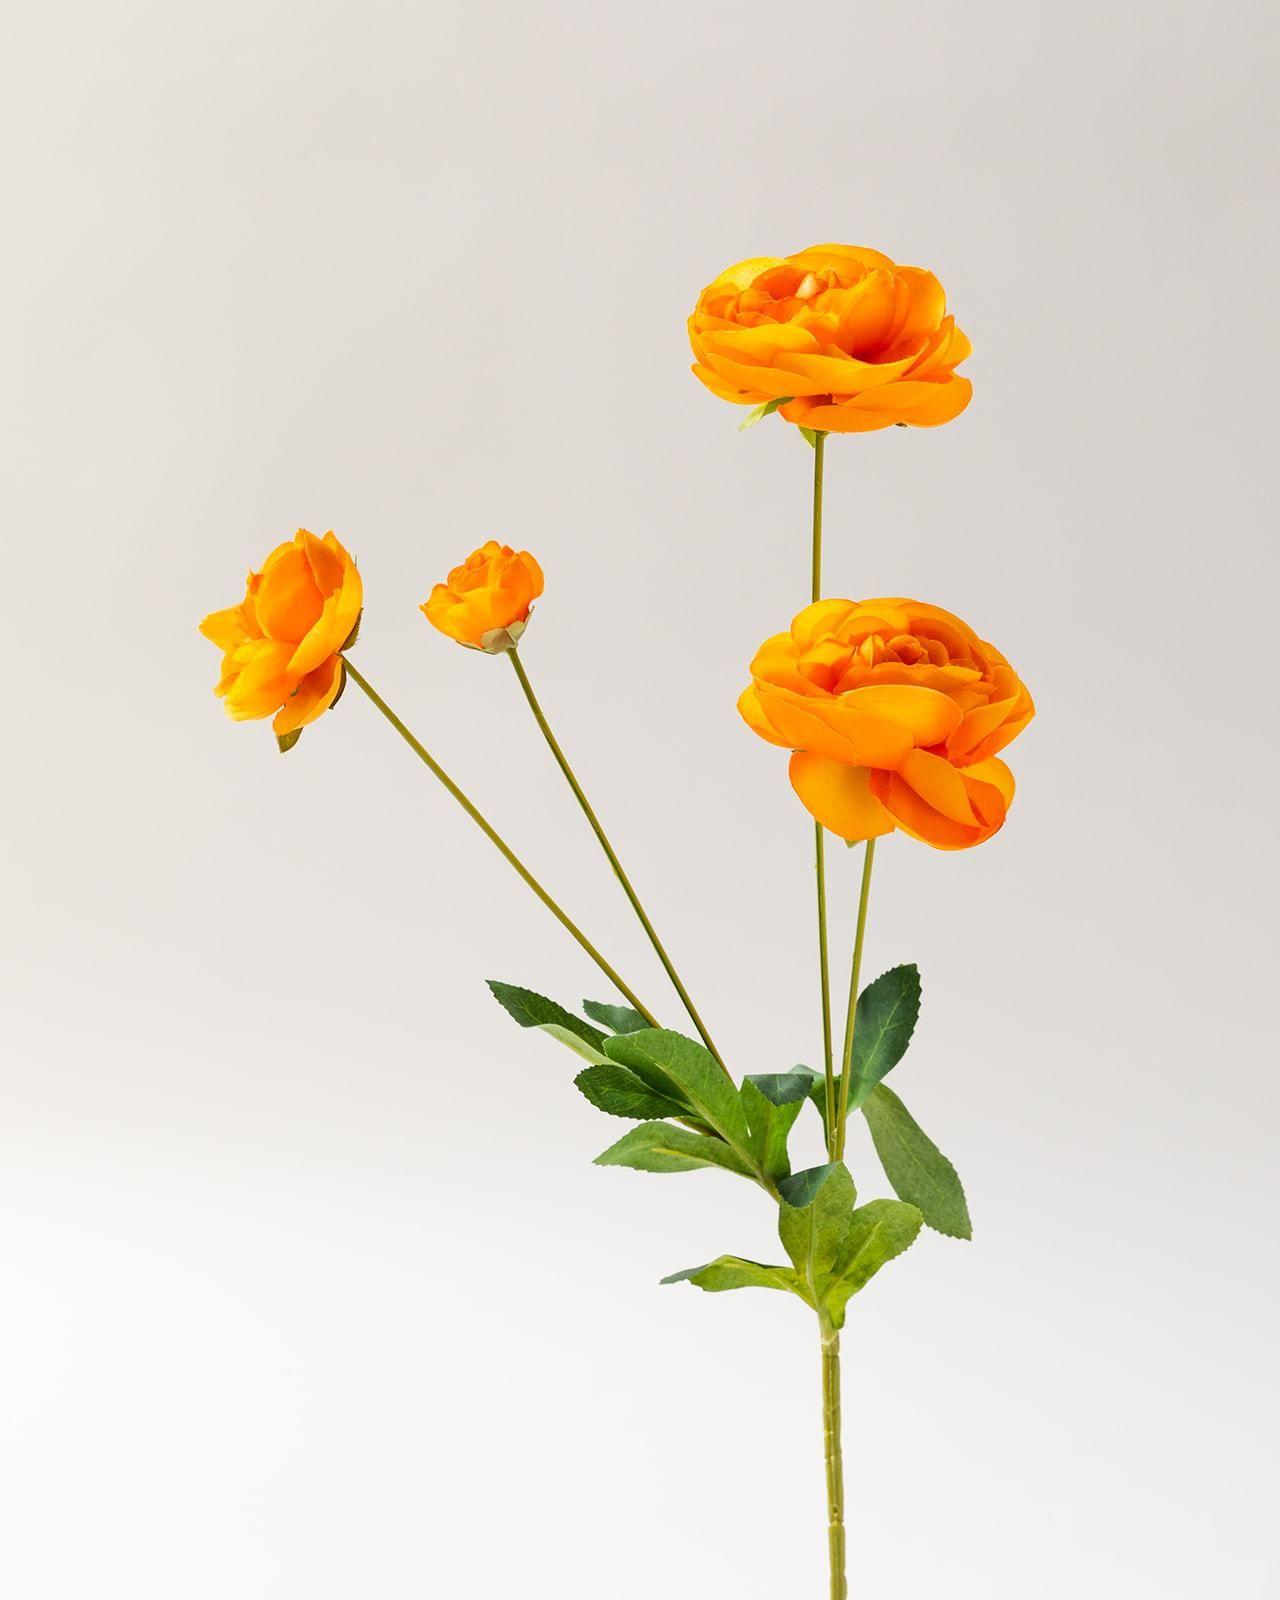 Orange Ranunculus Bunch (10 stems)